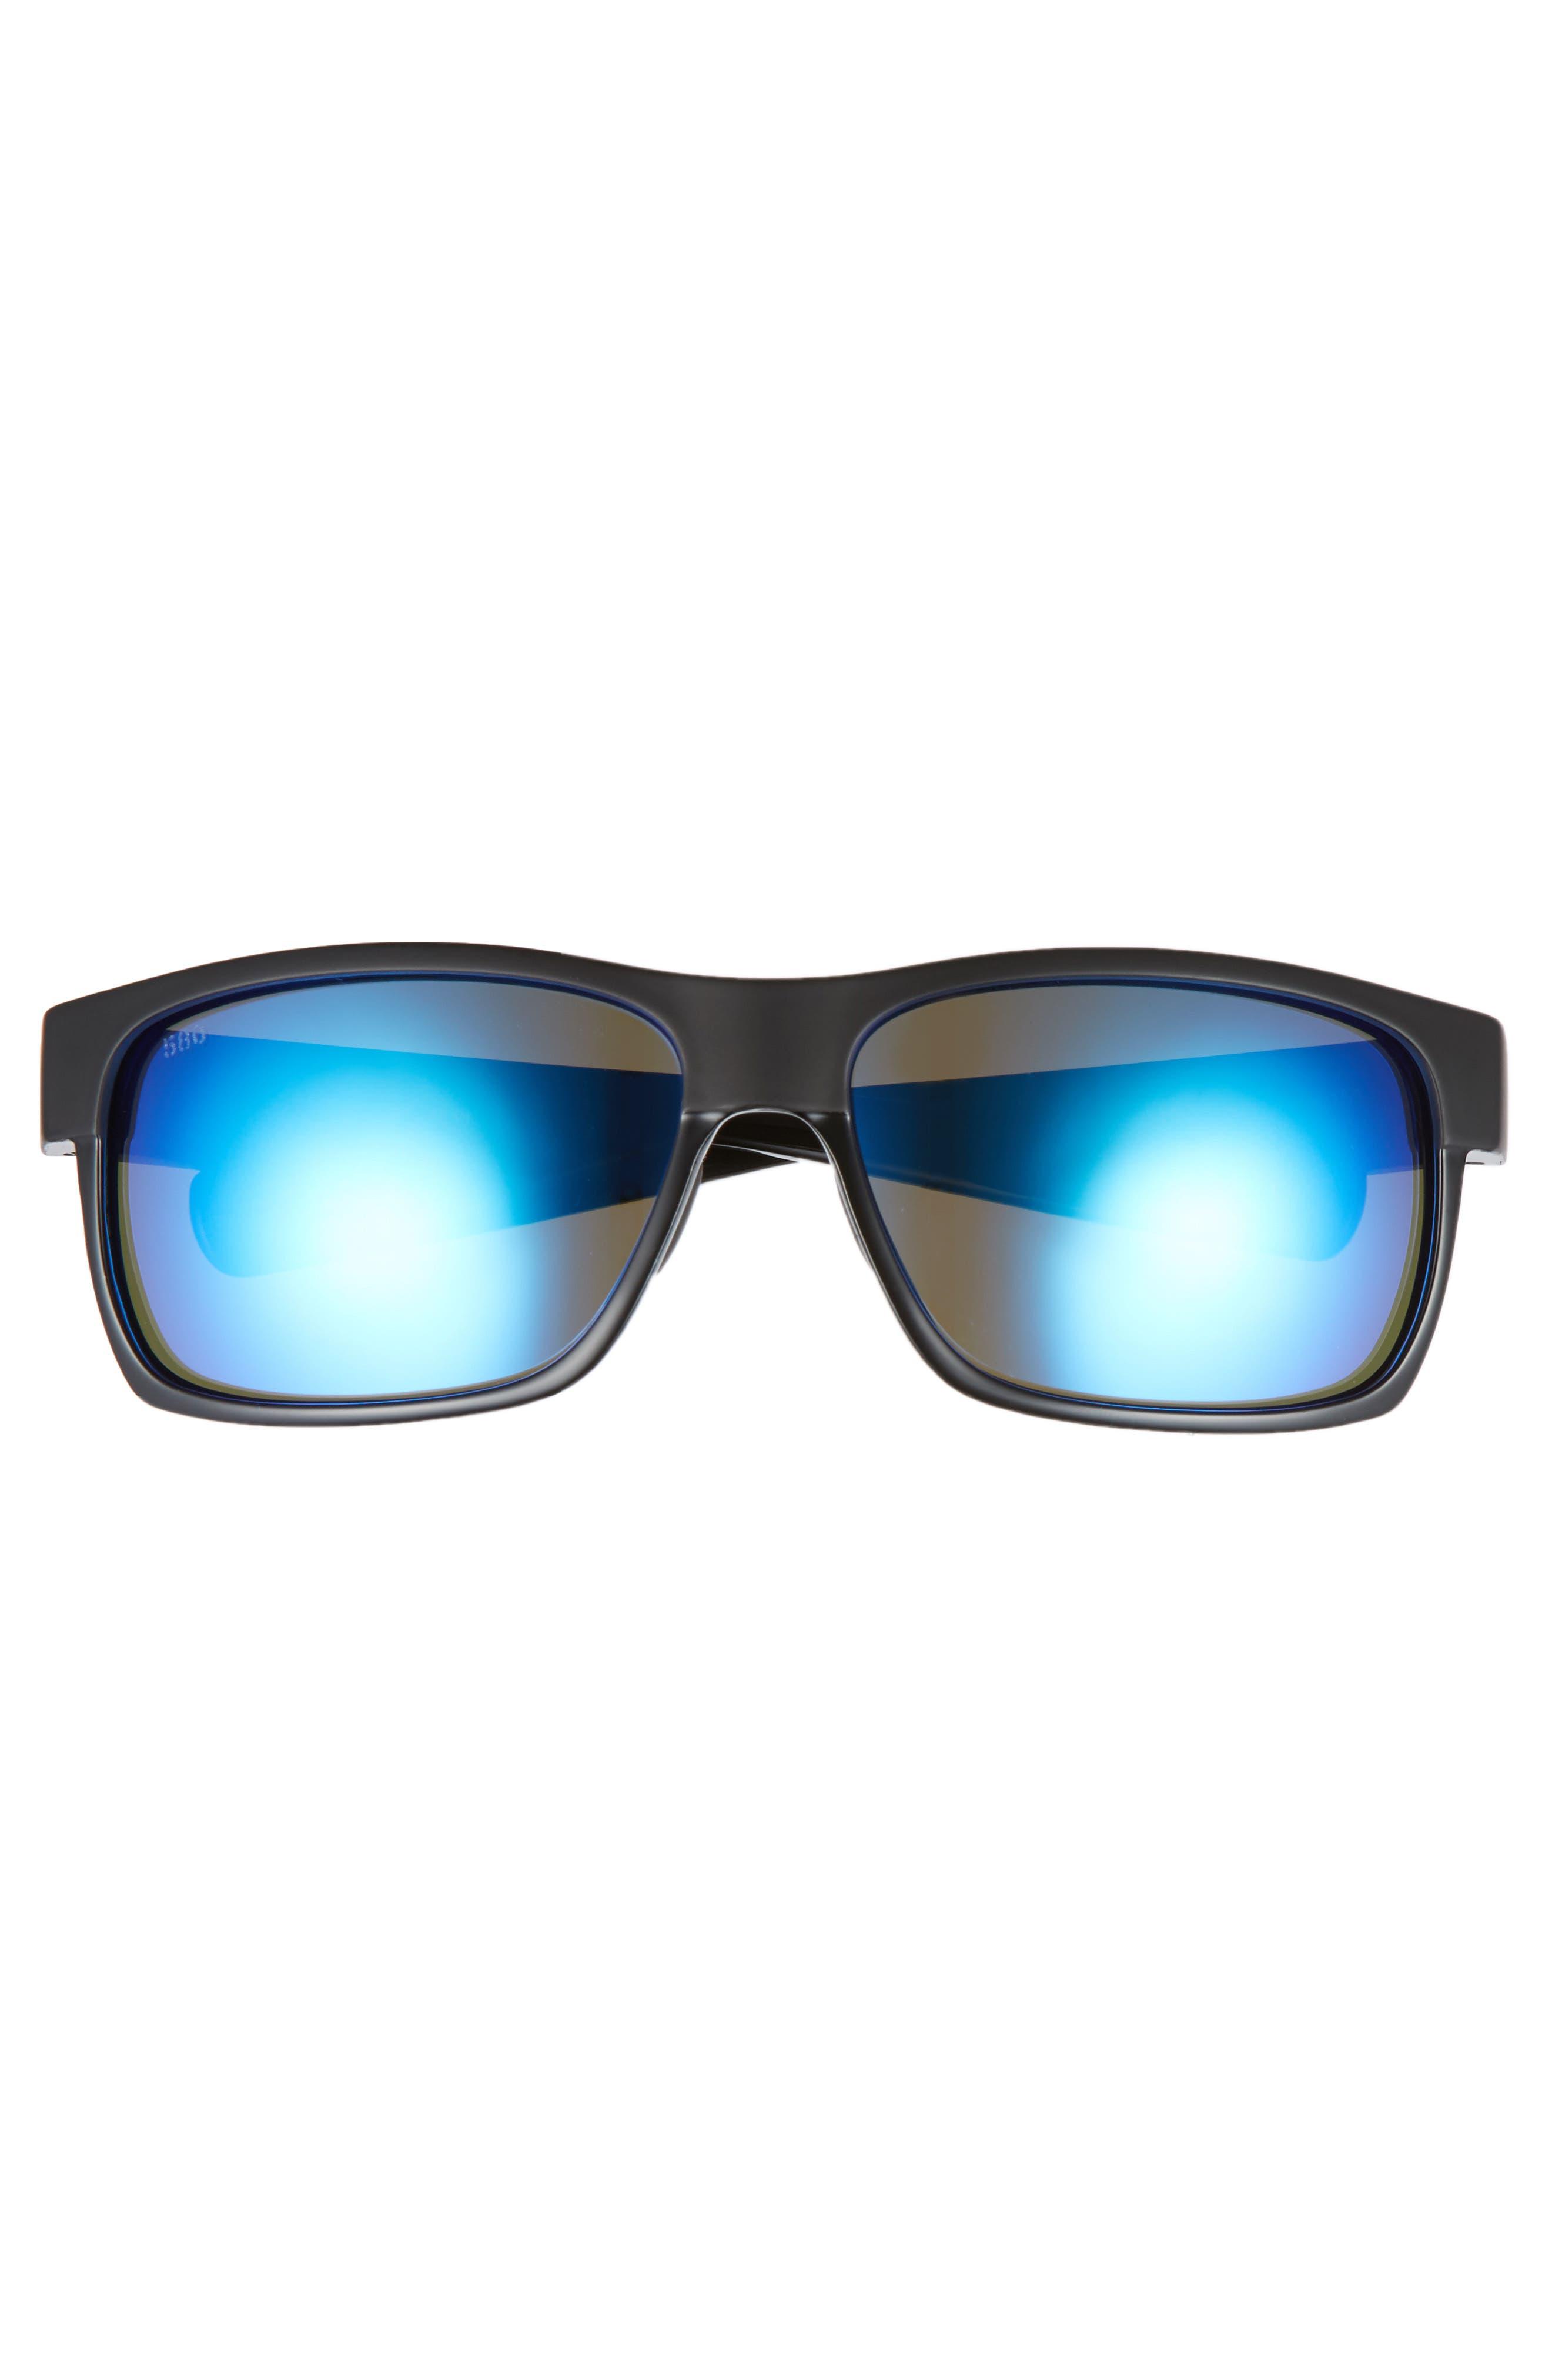 Half Moon 60mm Polarized Sunglasses,                             Alternate thumbnail 2, color,                             001